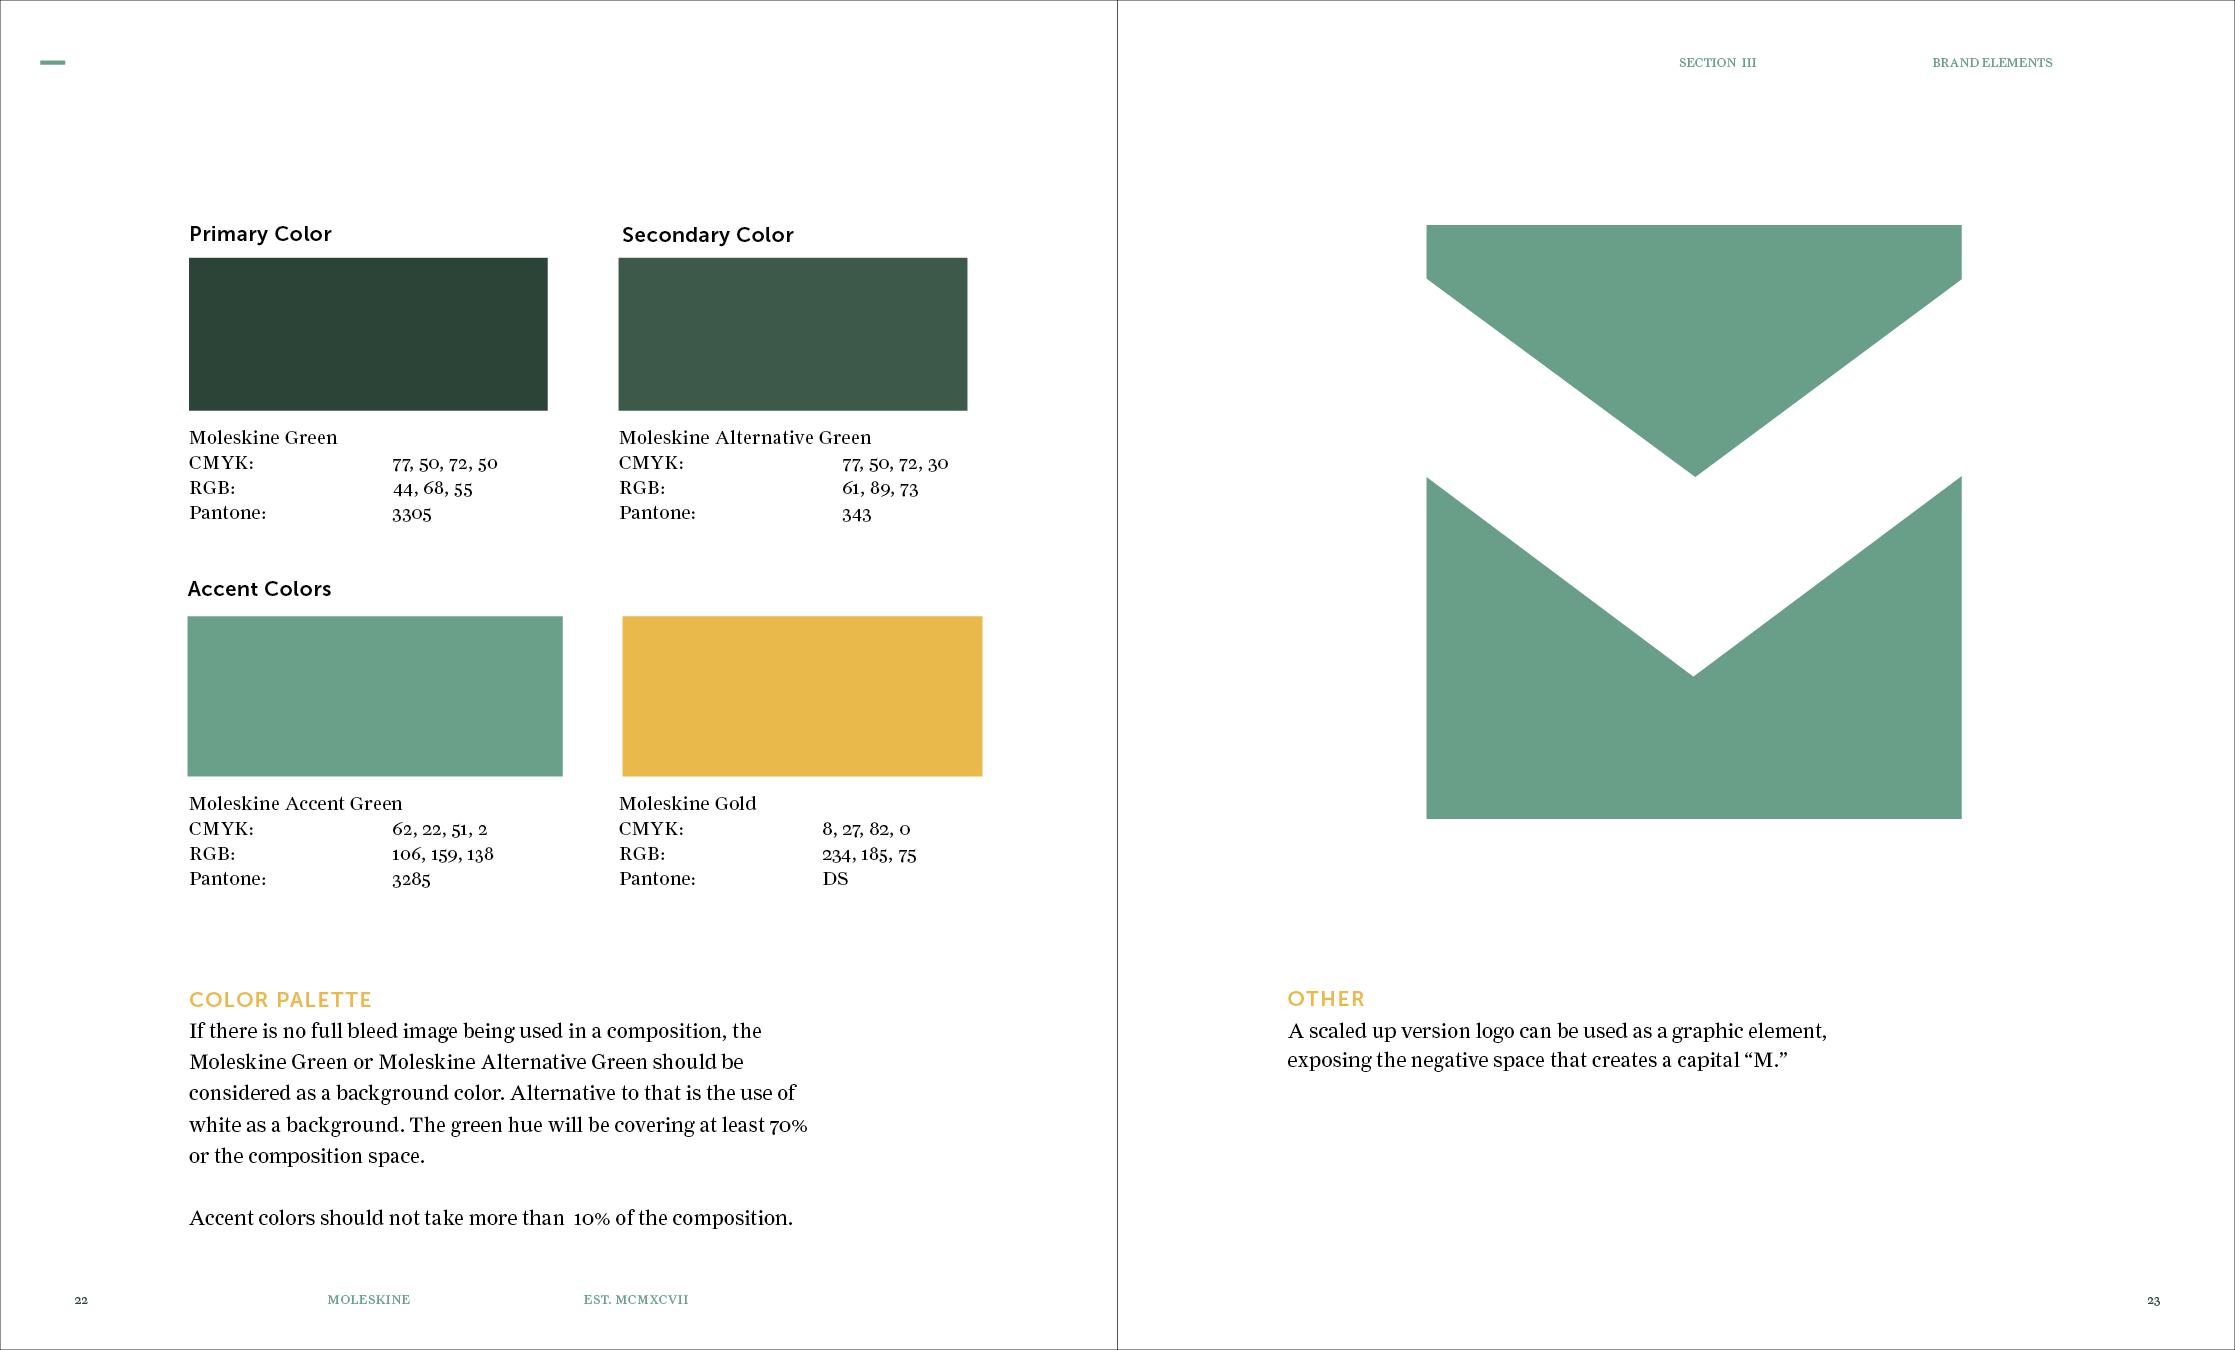 moleskine-brandbook12.jpg